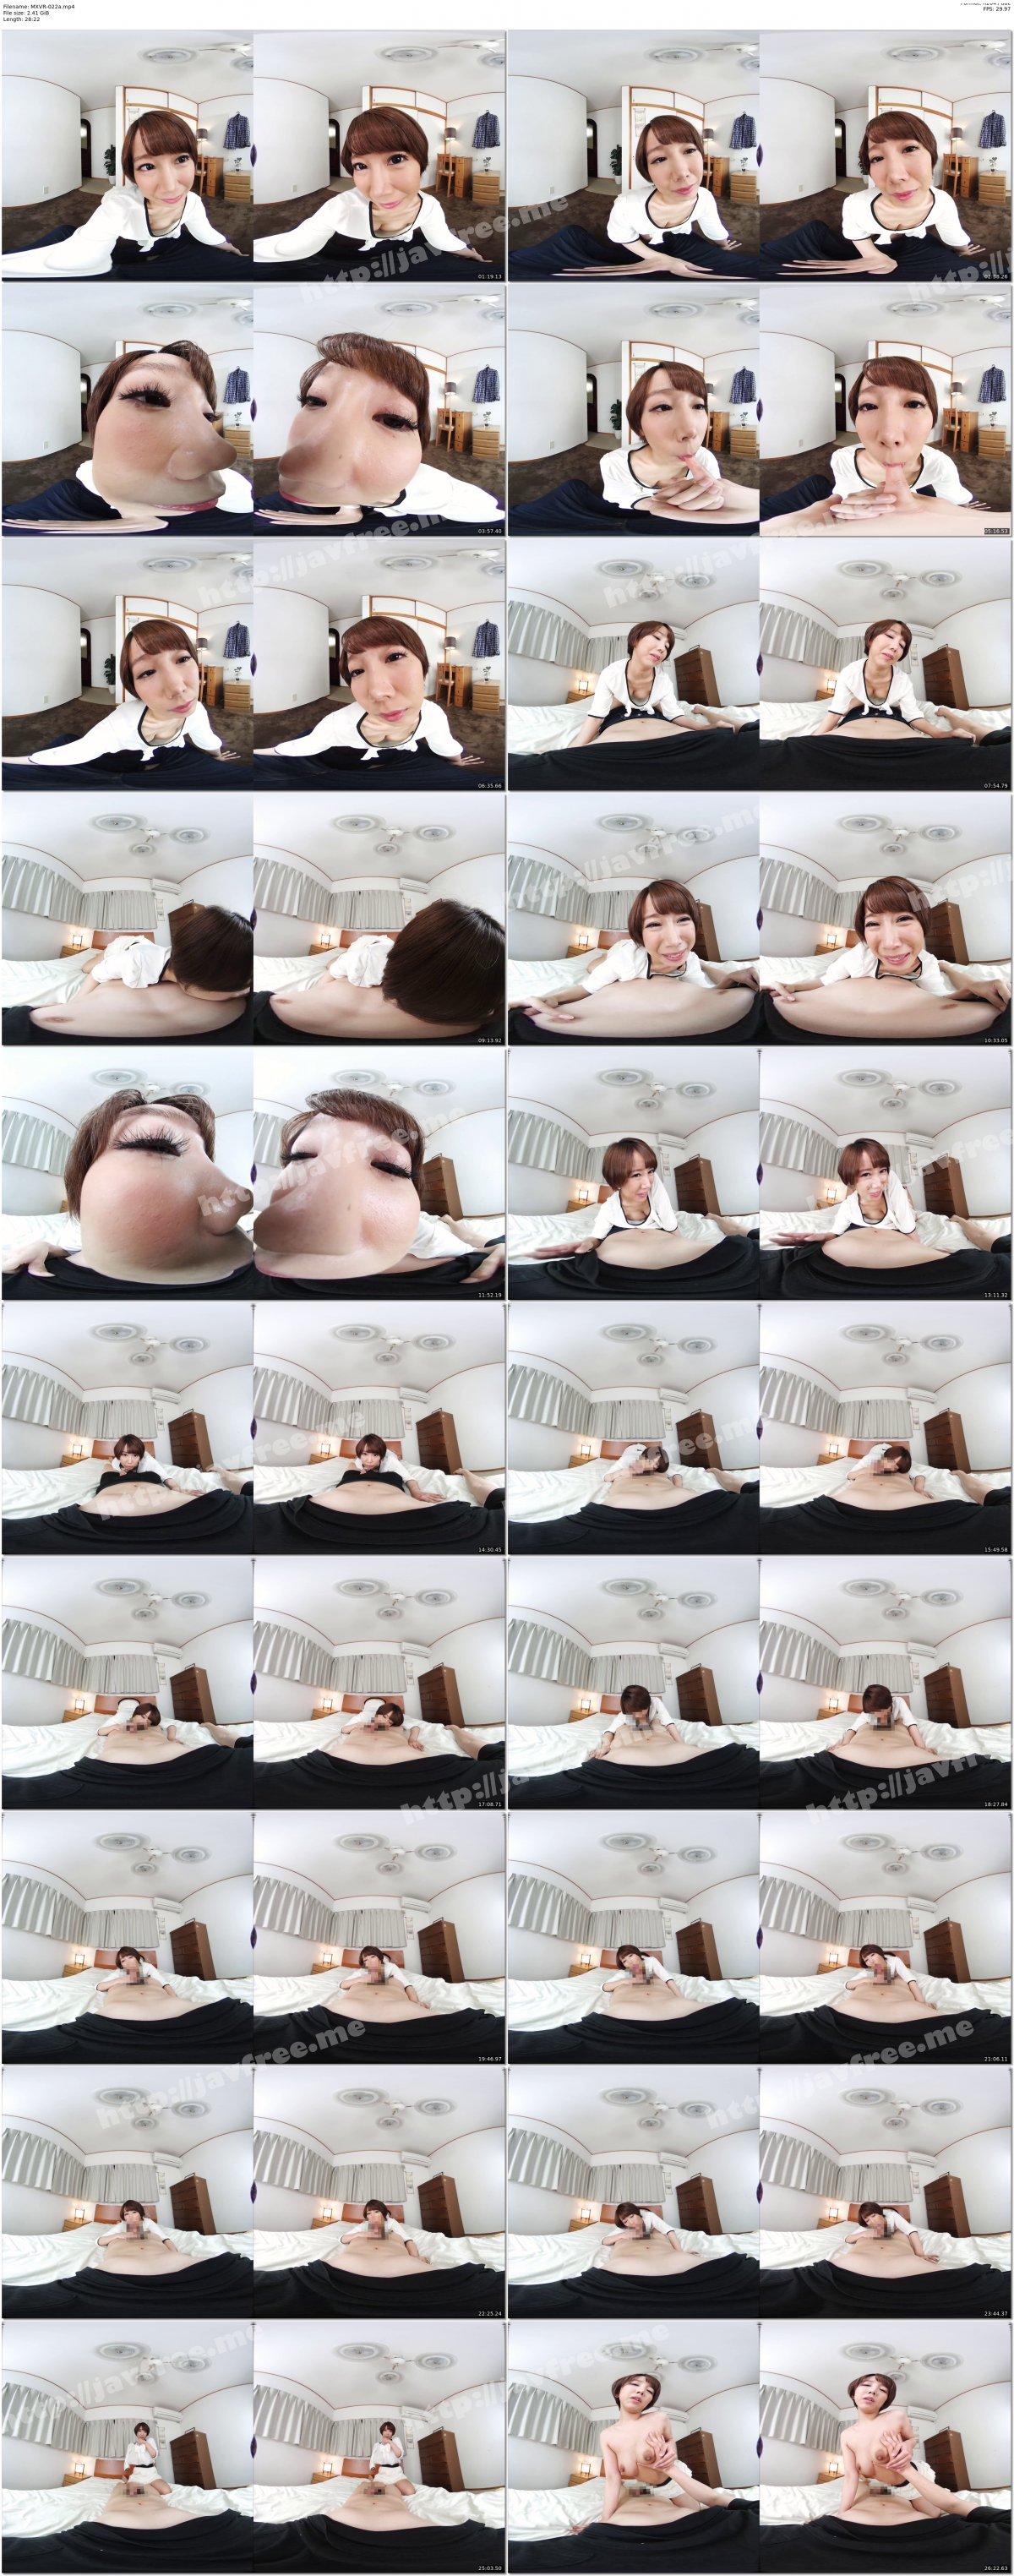 [MXVR-022] 【VR】男を魅了する最強風俗娘がVRに登場!凄腕テクで脳天直撃!【最上さゆき】 - image MXVR-022a on https://javfree.me